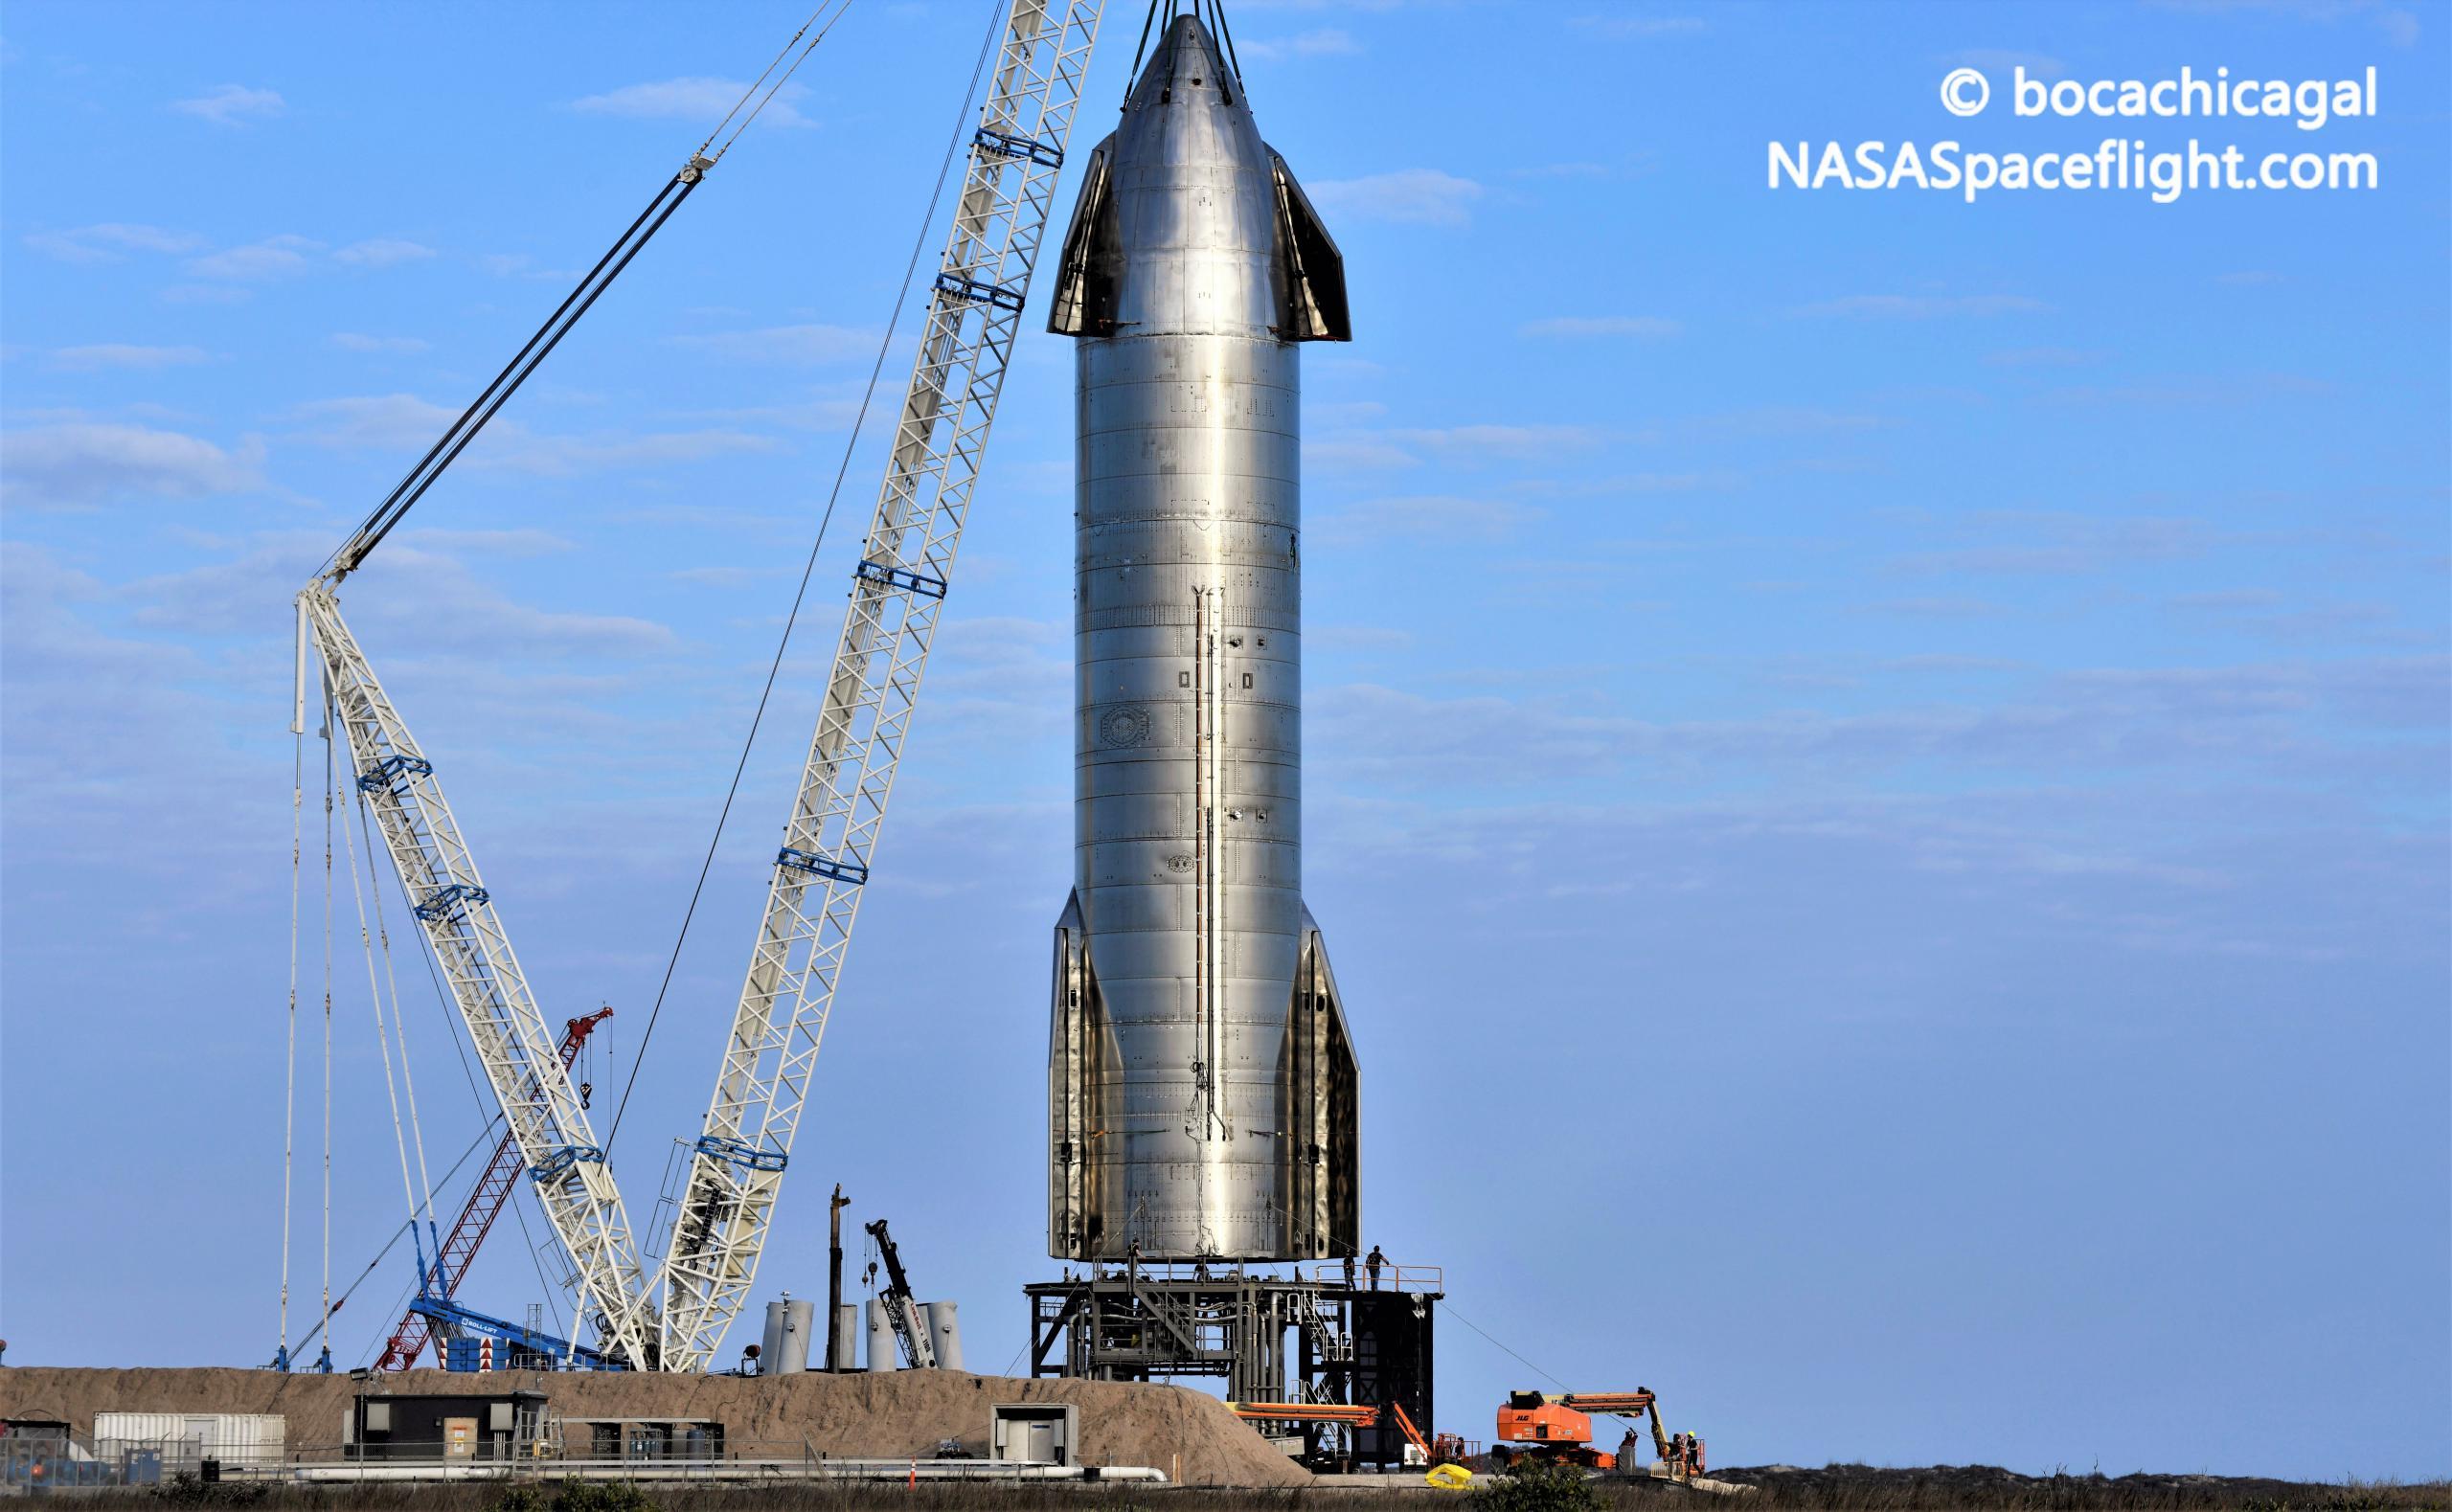 Starship Boca Chica 030821 (NASASpaceflight – bocachicagal) SN11 pad install 1 crop (c)